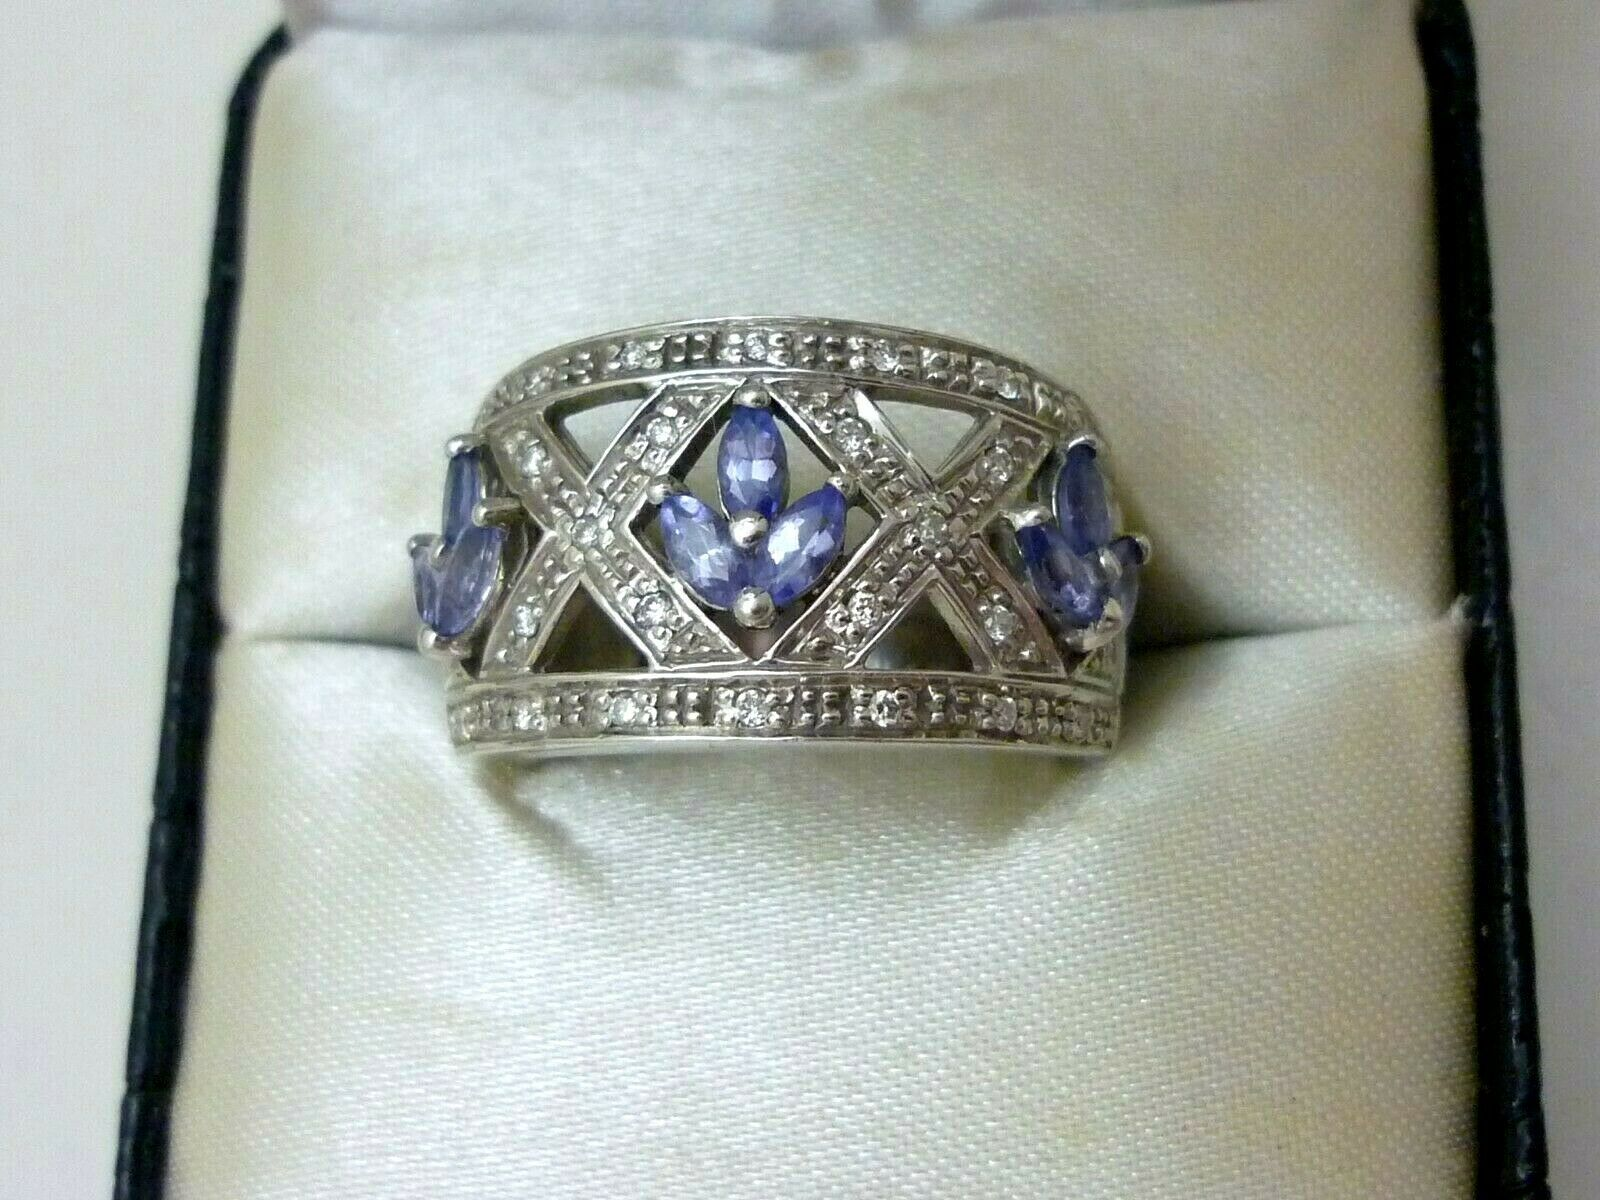 10k White Gold 56 Carat Womens Real Diamond Bridal Wedding Engagement Ring Gold D Yellow Gold Diamond Engagement Ring Black Gold Diamond White Diamond Rings